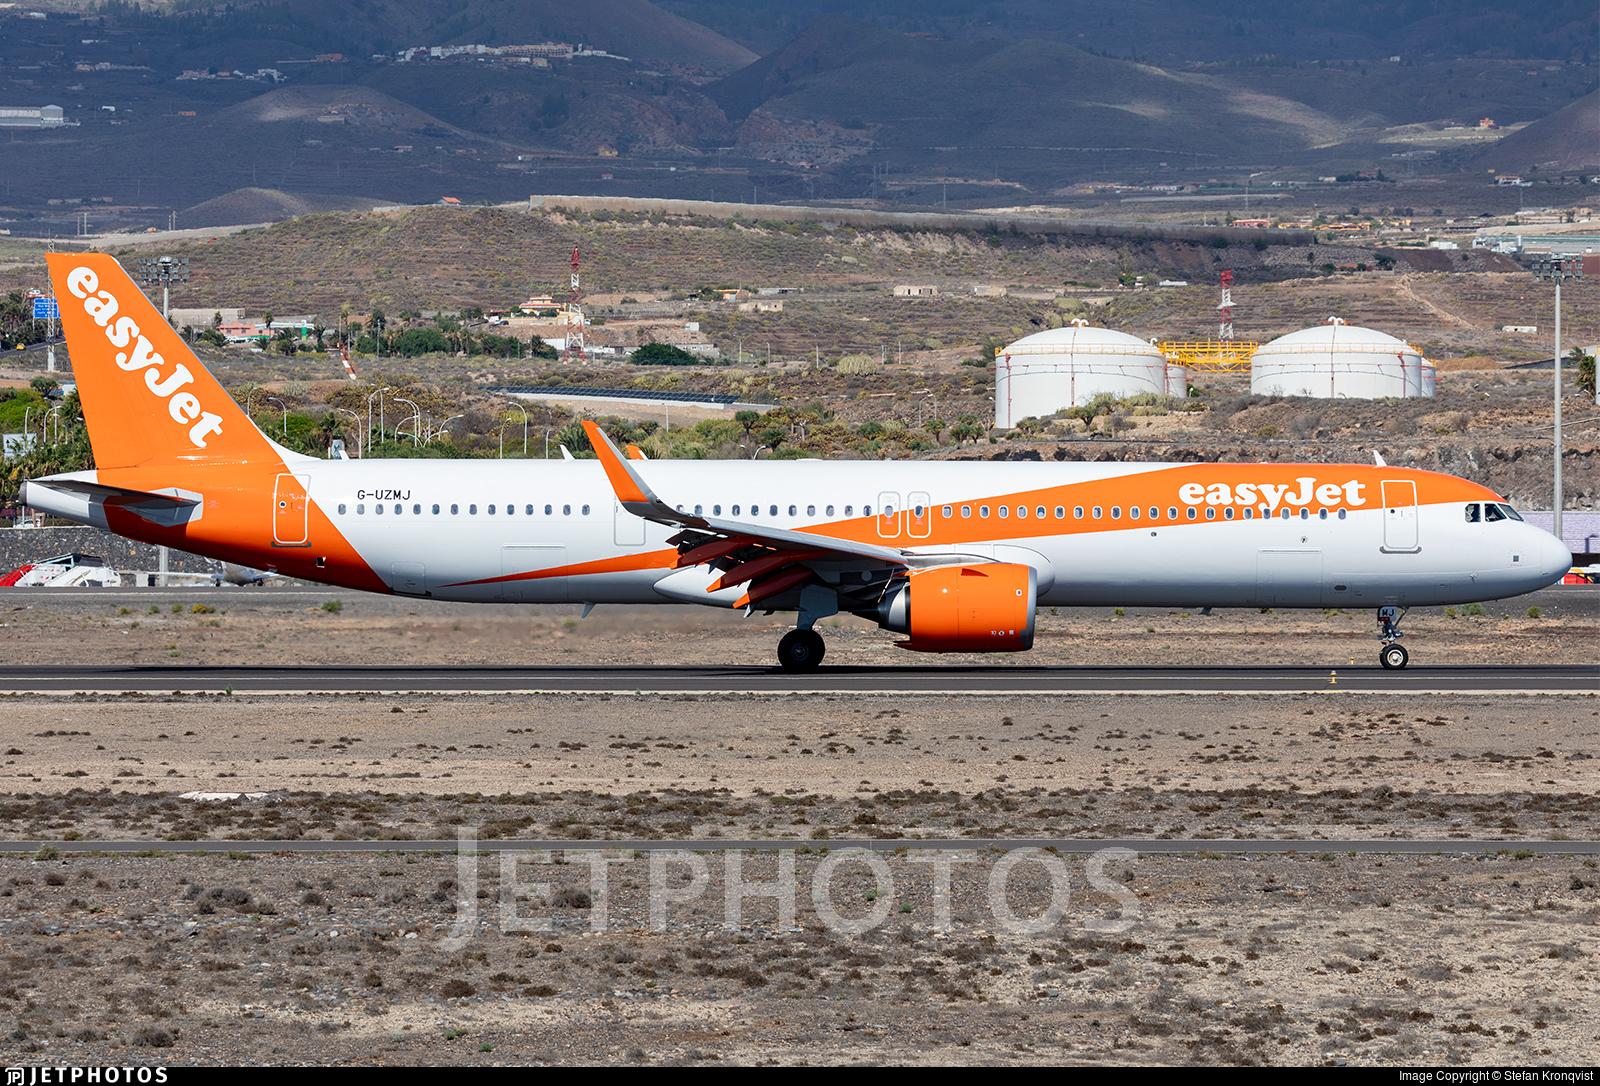 G-UZMJ - Airbus A321-251NX - easyJet